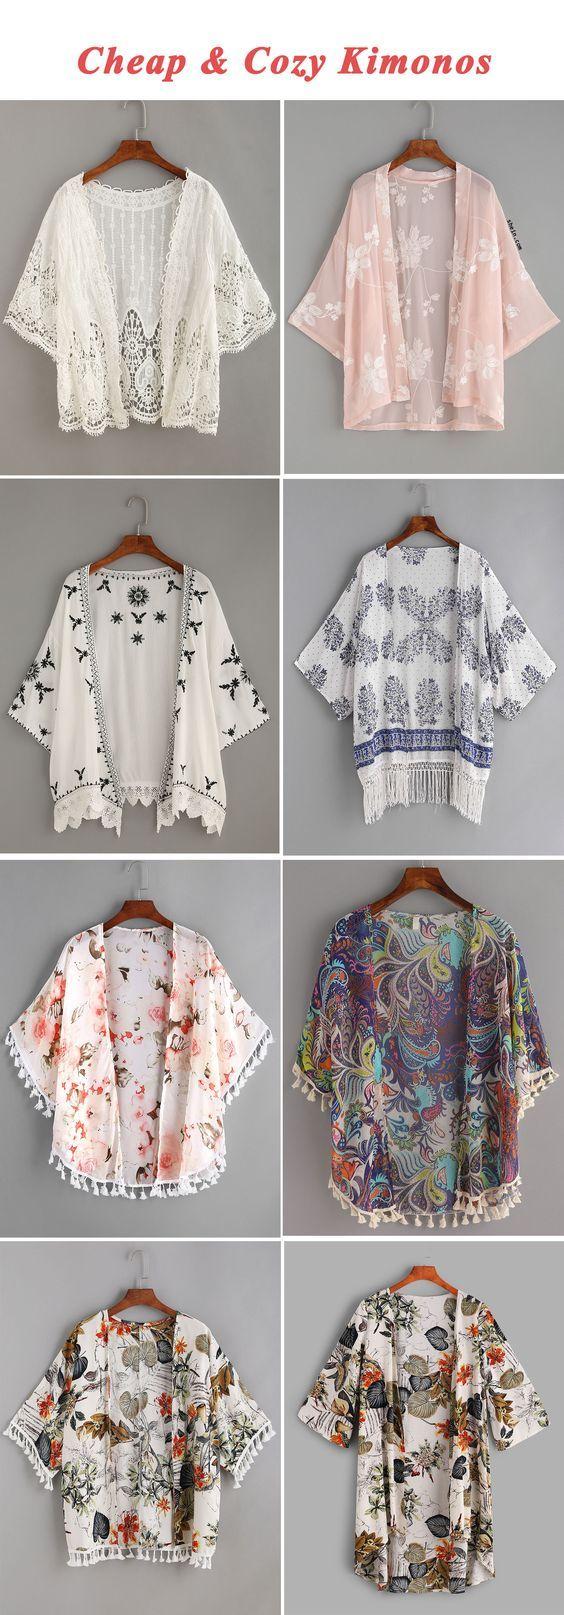 Cheap & cozy kimonos #outfits4school